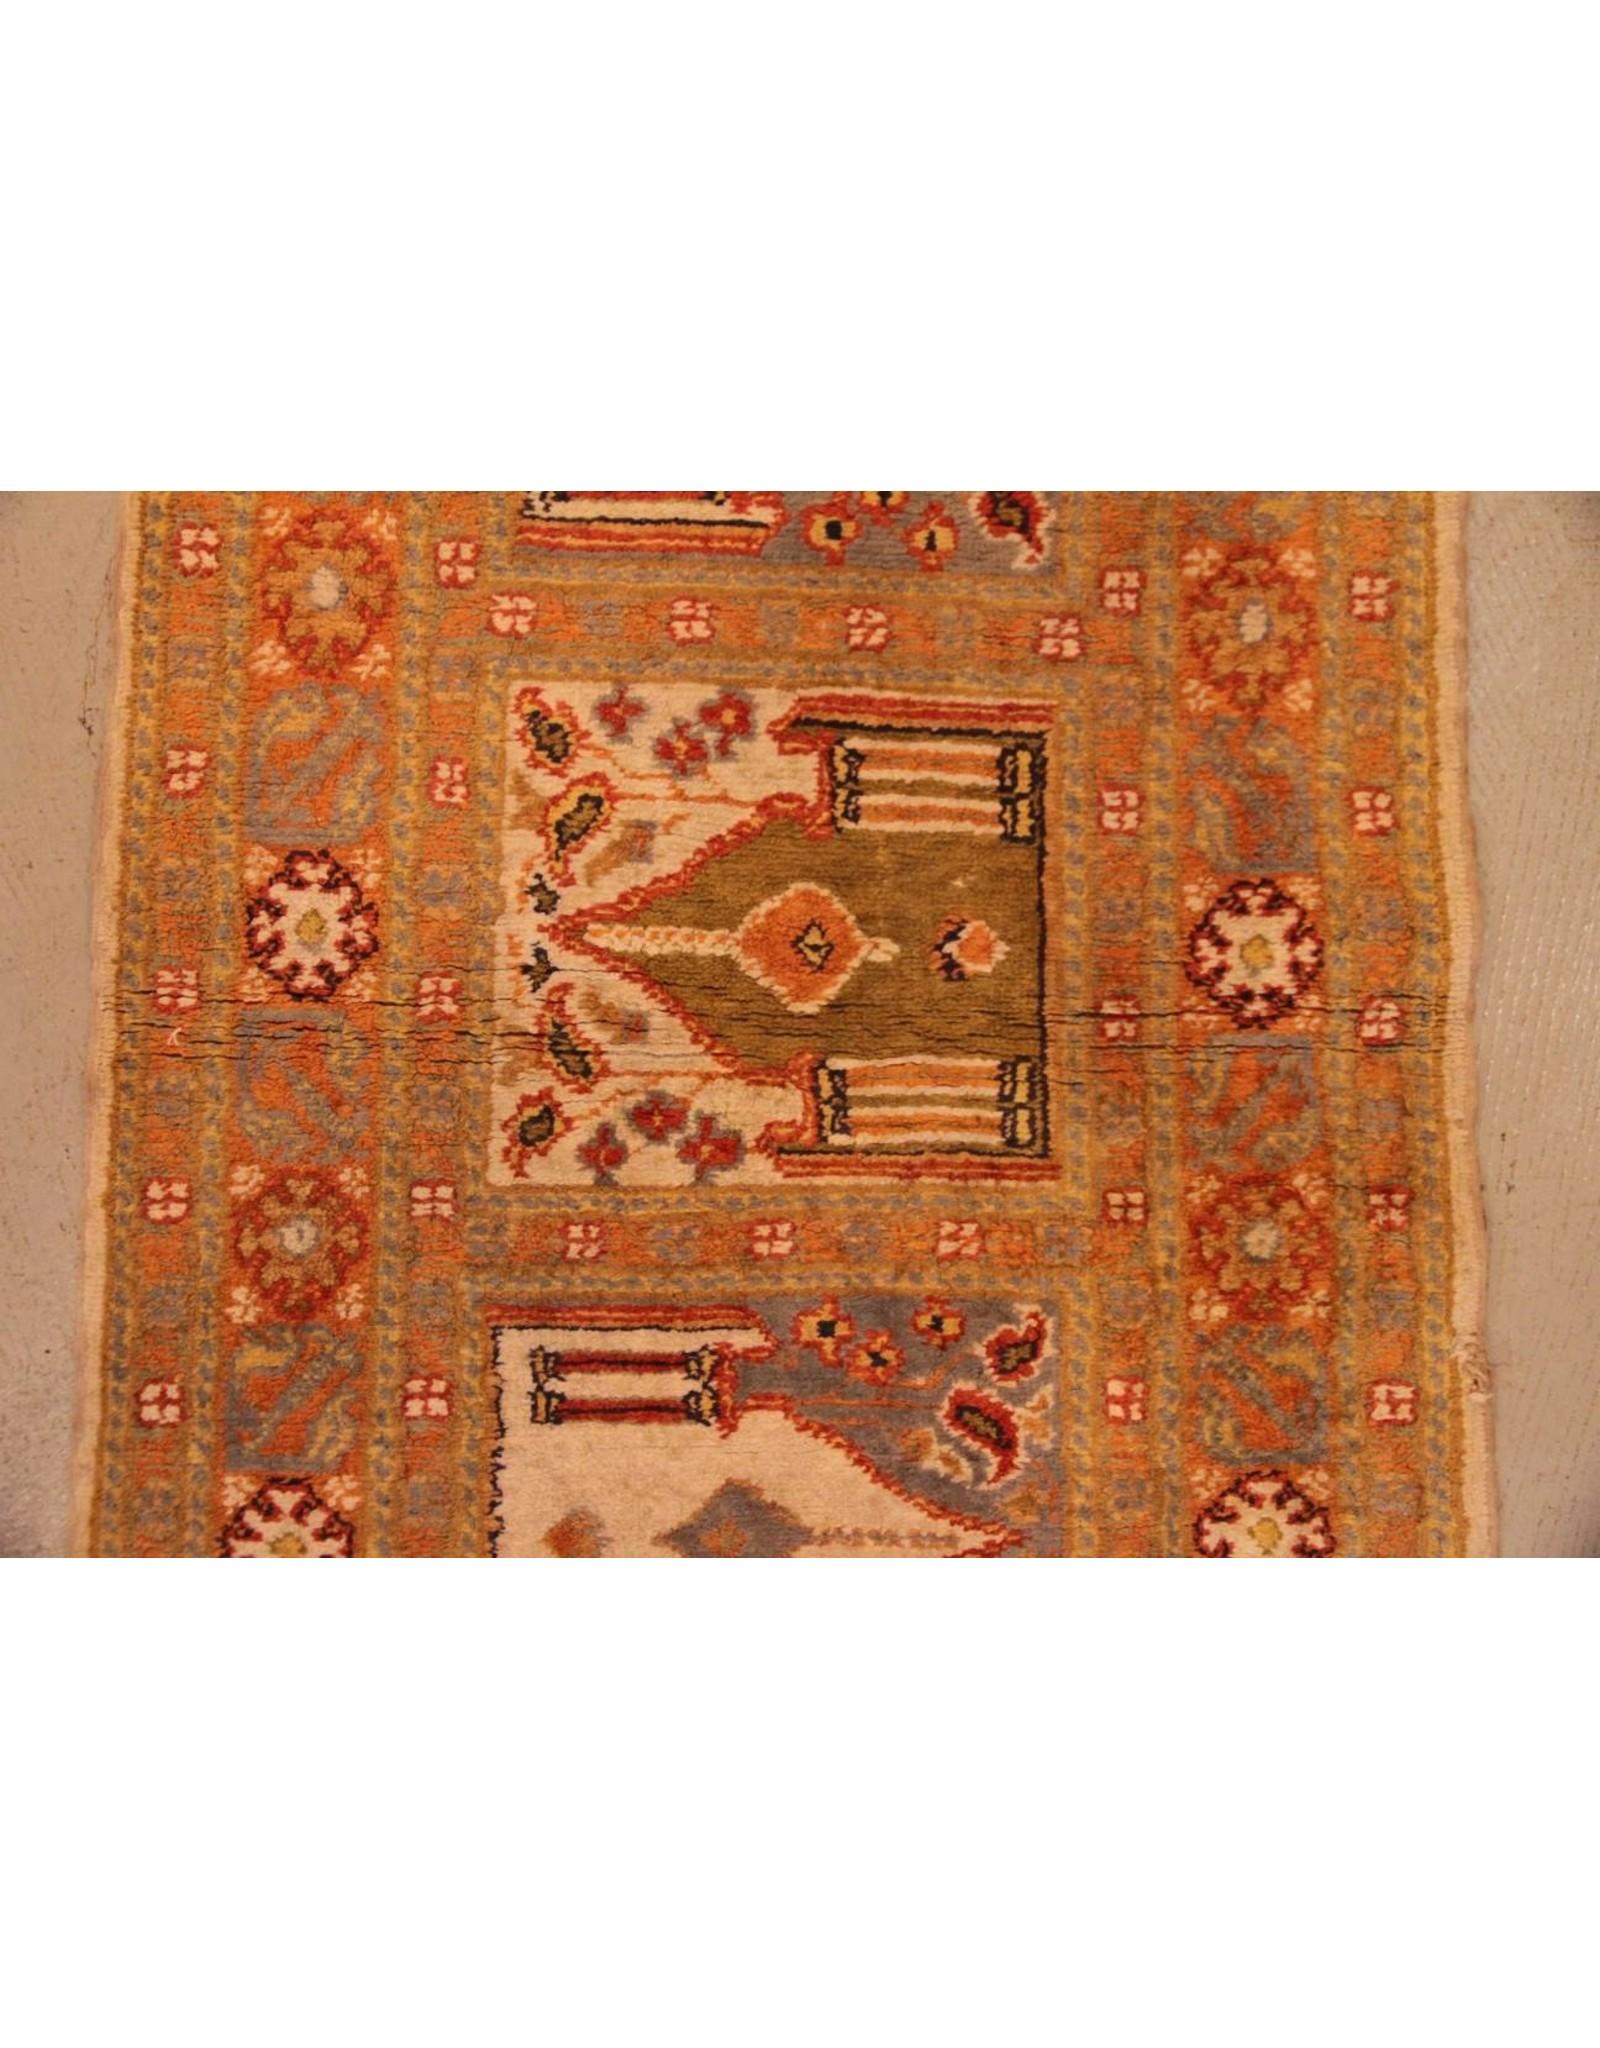 Carpet - runner, 2' x 6', soft green and blue hues